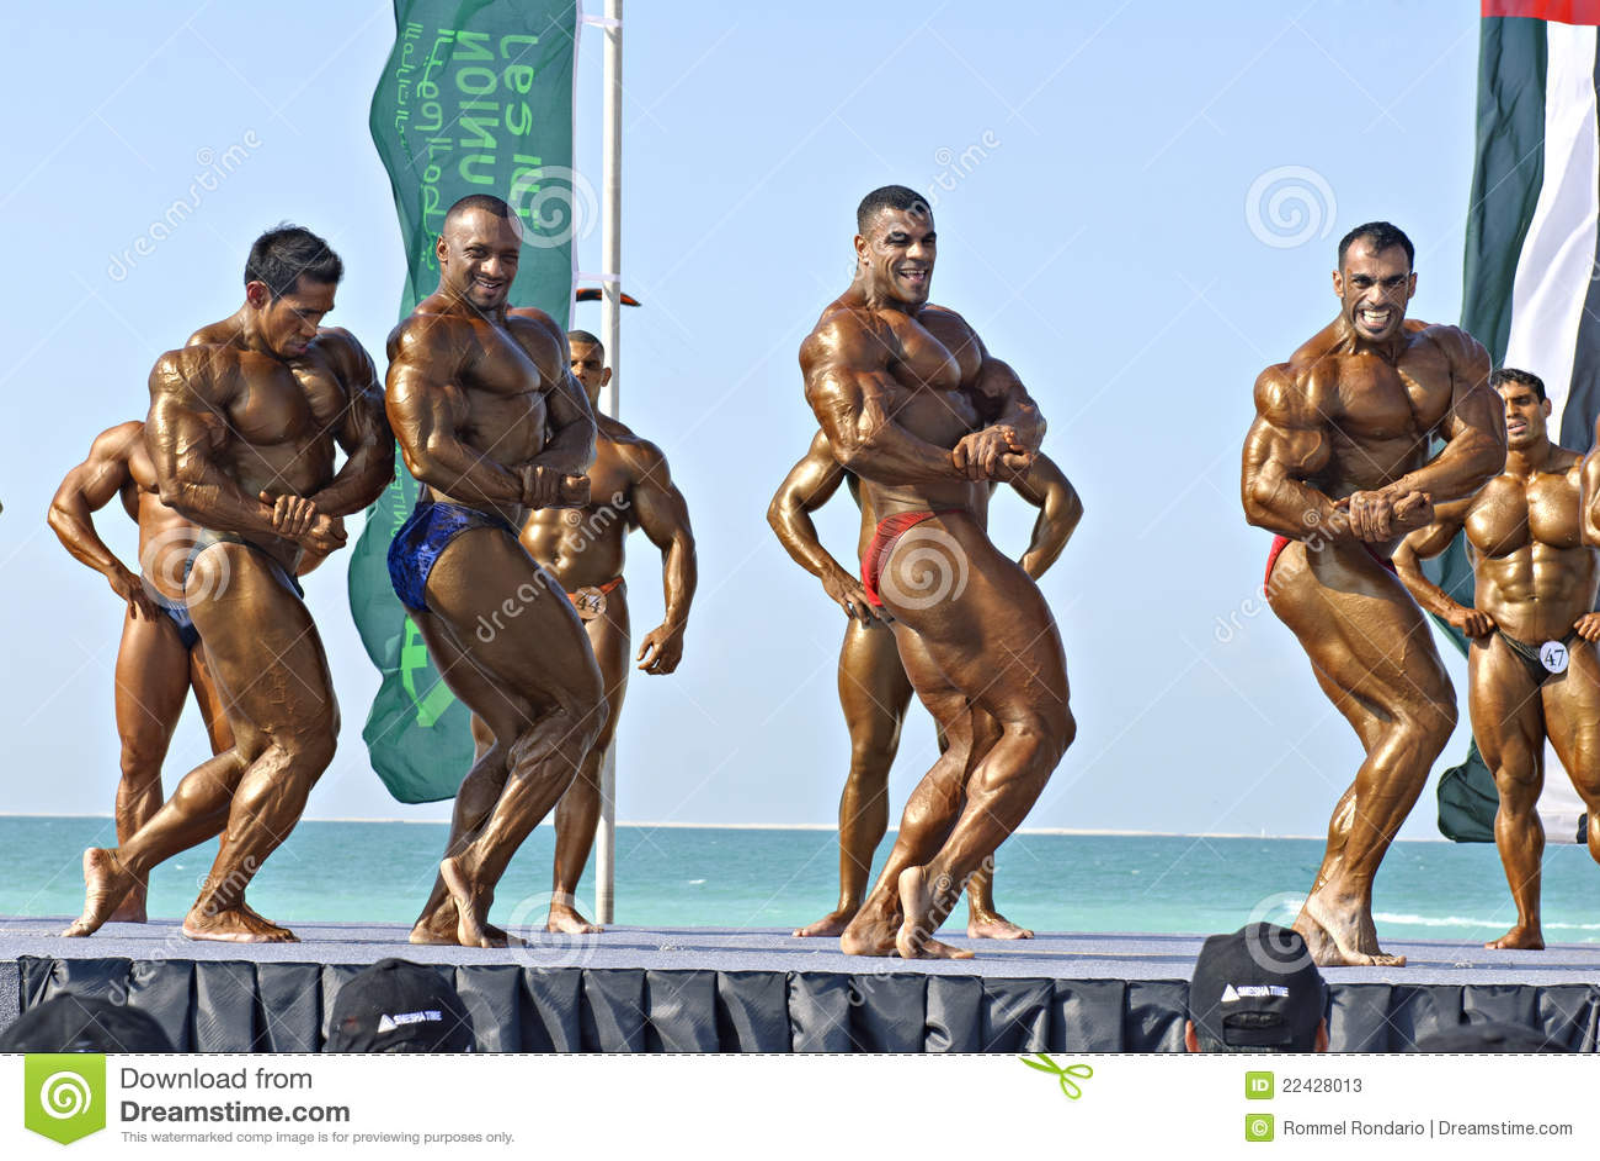 HIMMEL-STURZFLUG-DUBAI-Bodybuilding-Meisterschaft 3